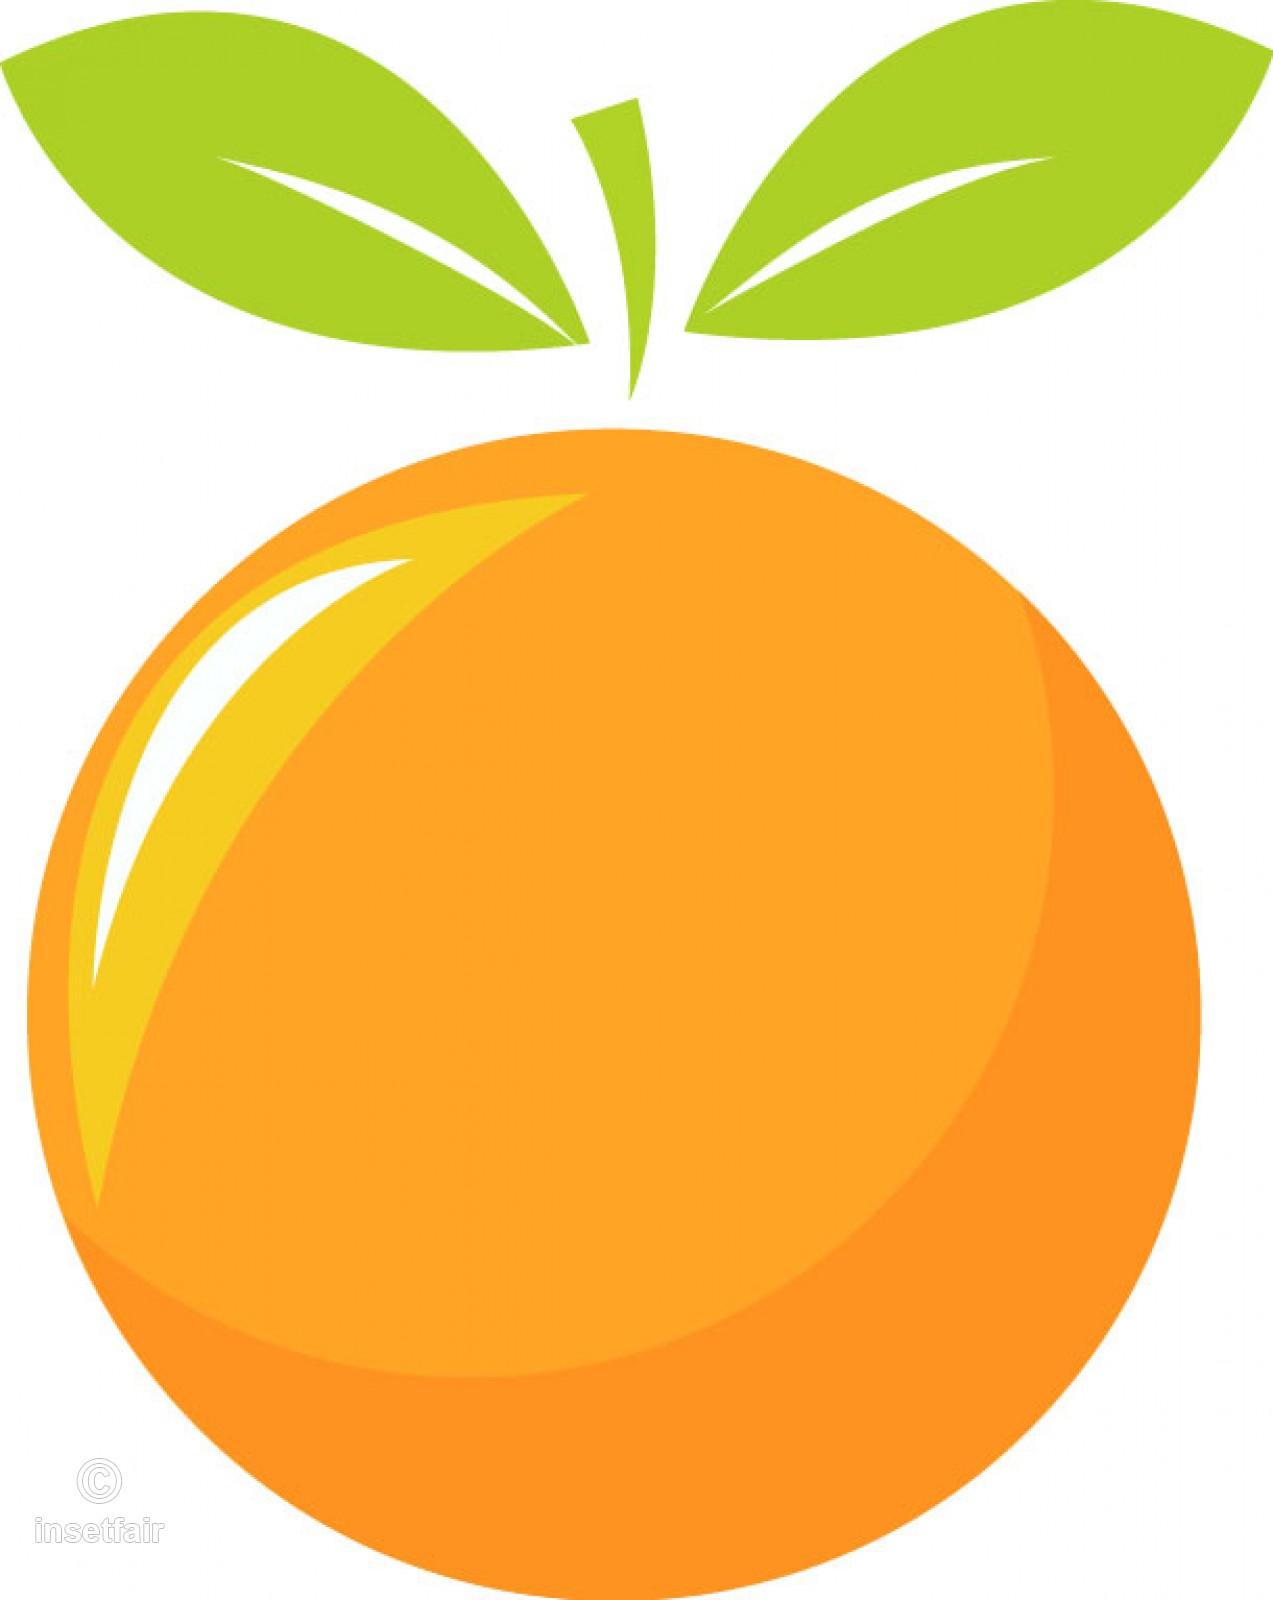 Orange fruit vector illustration clipart image.